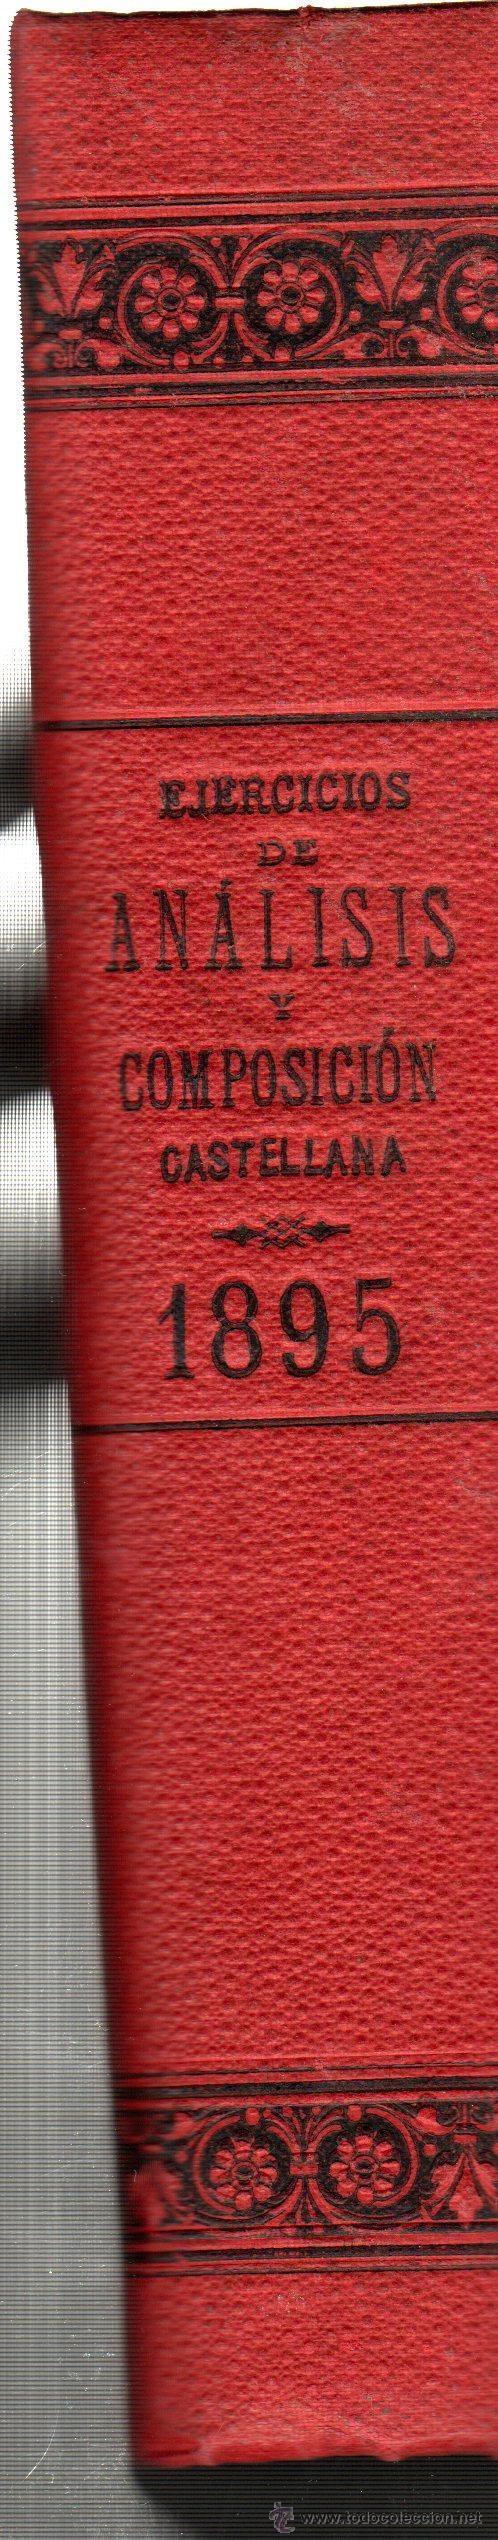 Libros antiguos: EJERCICIOS DE ANÁLISIS Y COMPOSICIÓN CASTELLANA,RICARDO GIRÓN SEVERINI,CÁDIZ,BENÍTEZ ESTUDILLO 1894 - Foto 2 - 30282654